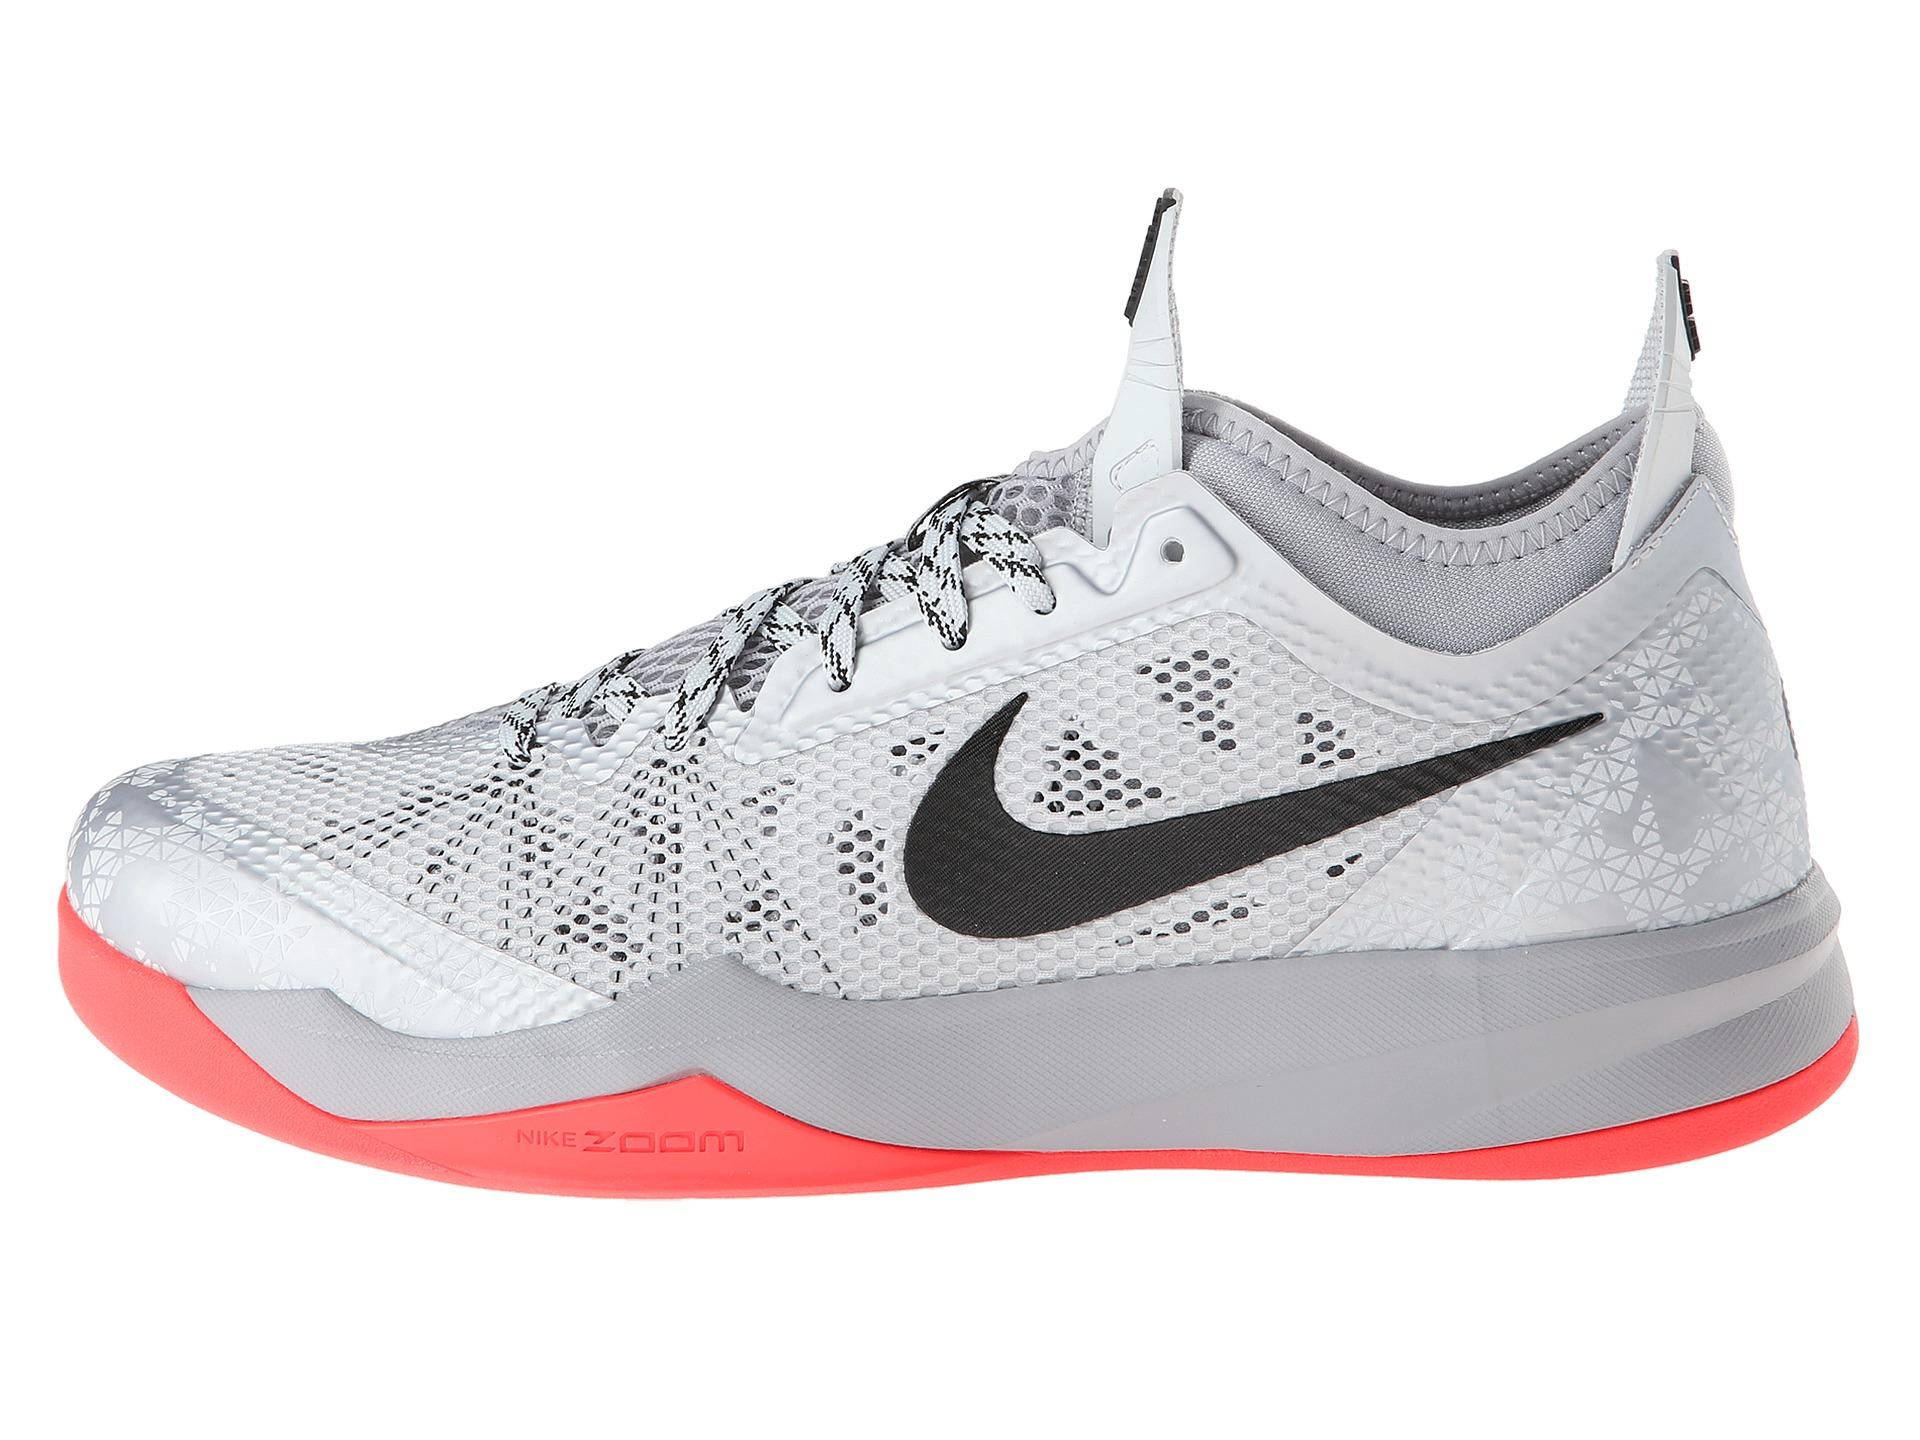 c40a6b891309 Nike Free Run Plus 2 Men Nike Sb What The Doernbecher Collection ...